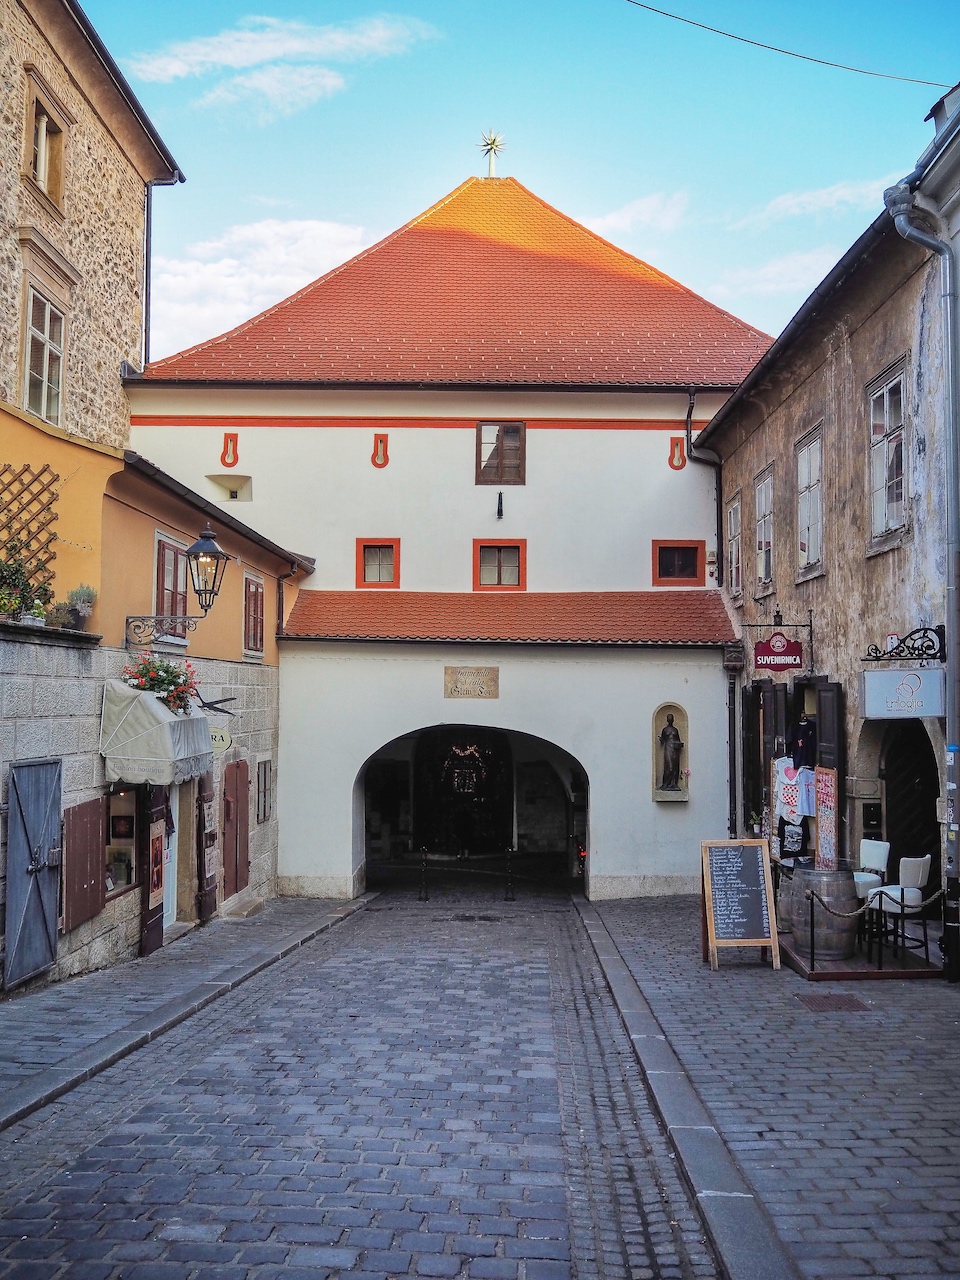 Stedentrip Zagreb - tips - kroatie - kaart Zagreb - Stone Gate; een heilige doorgang